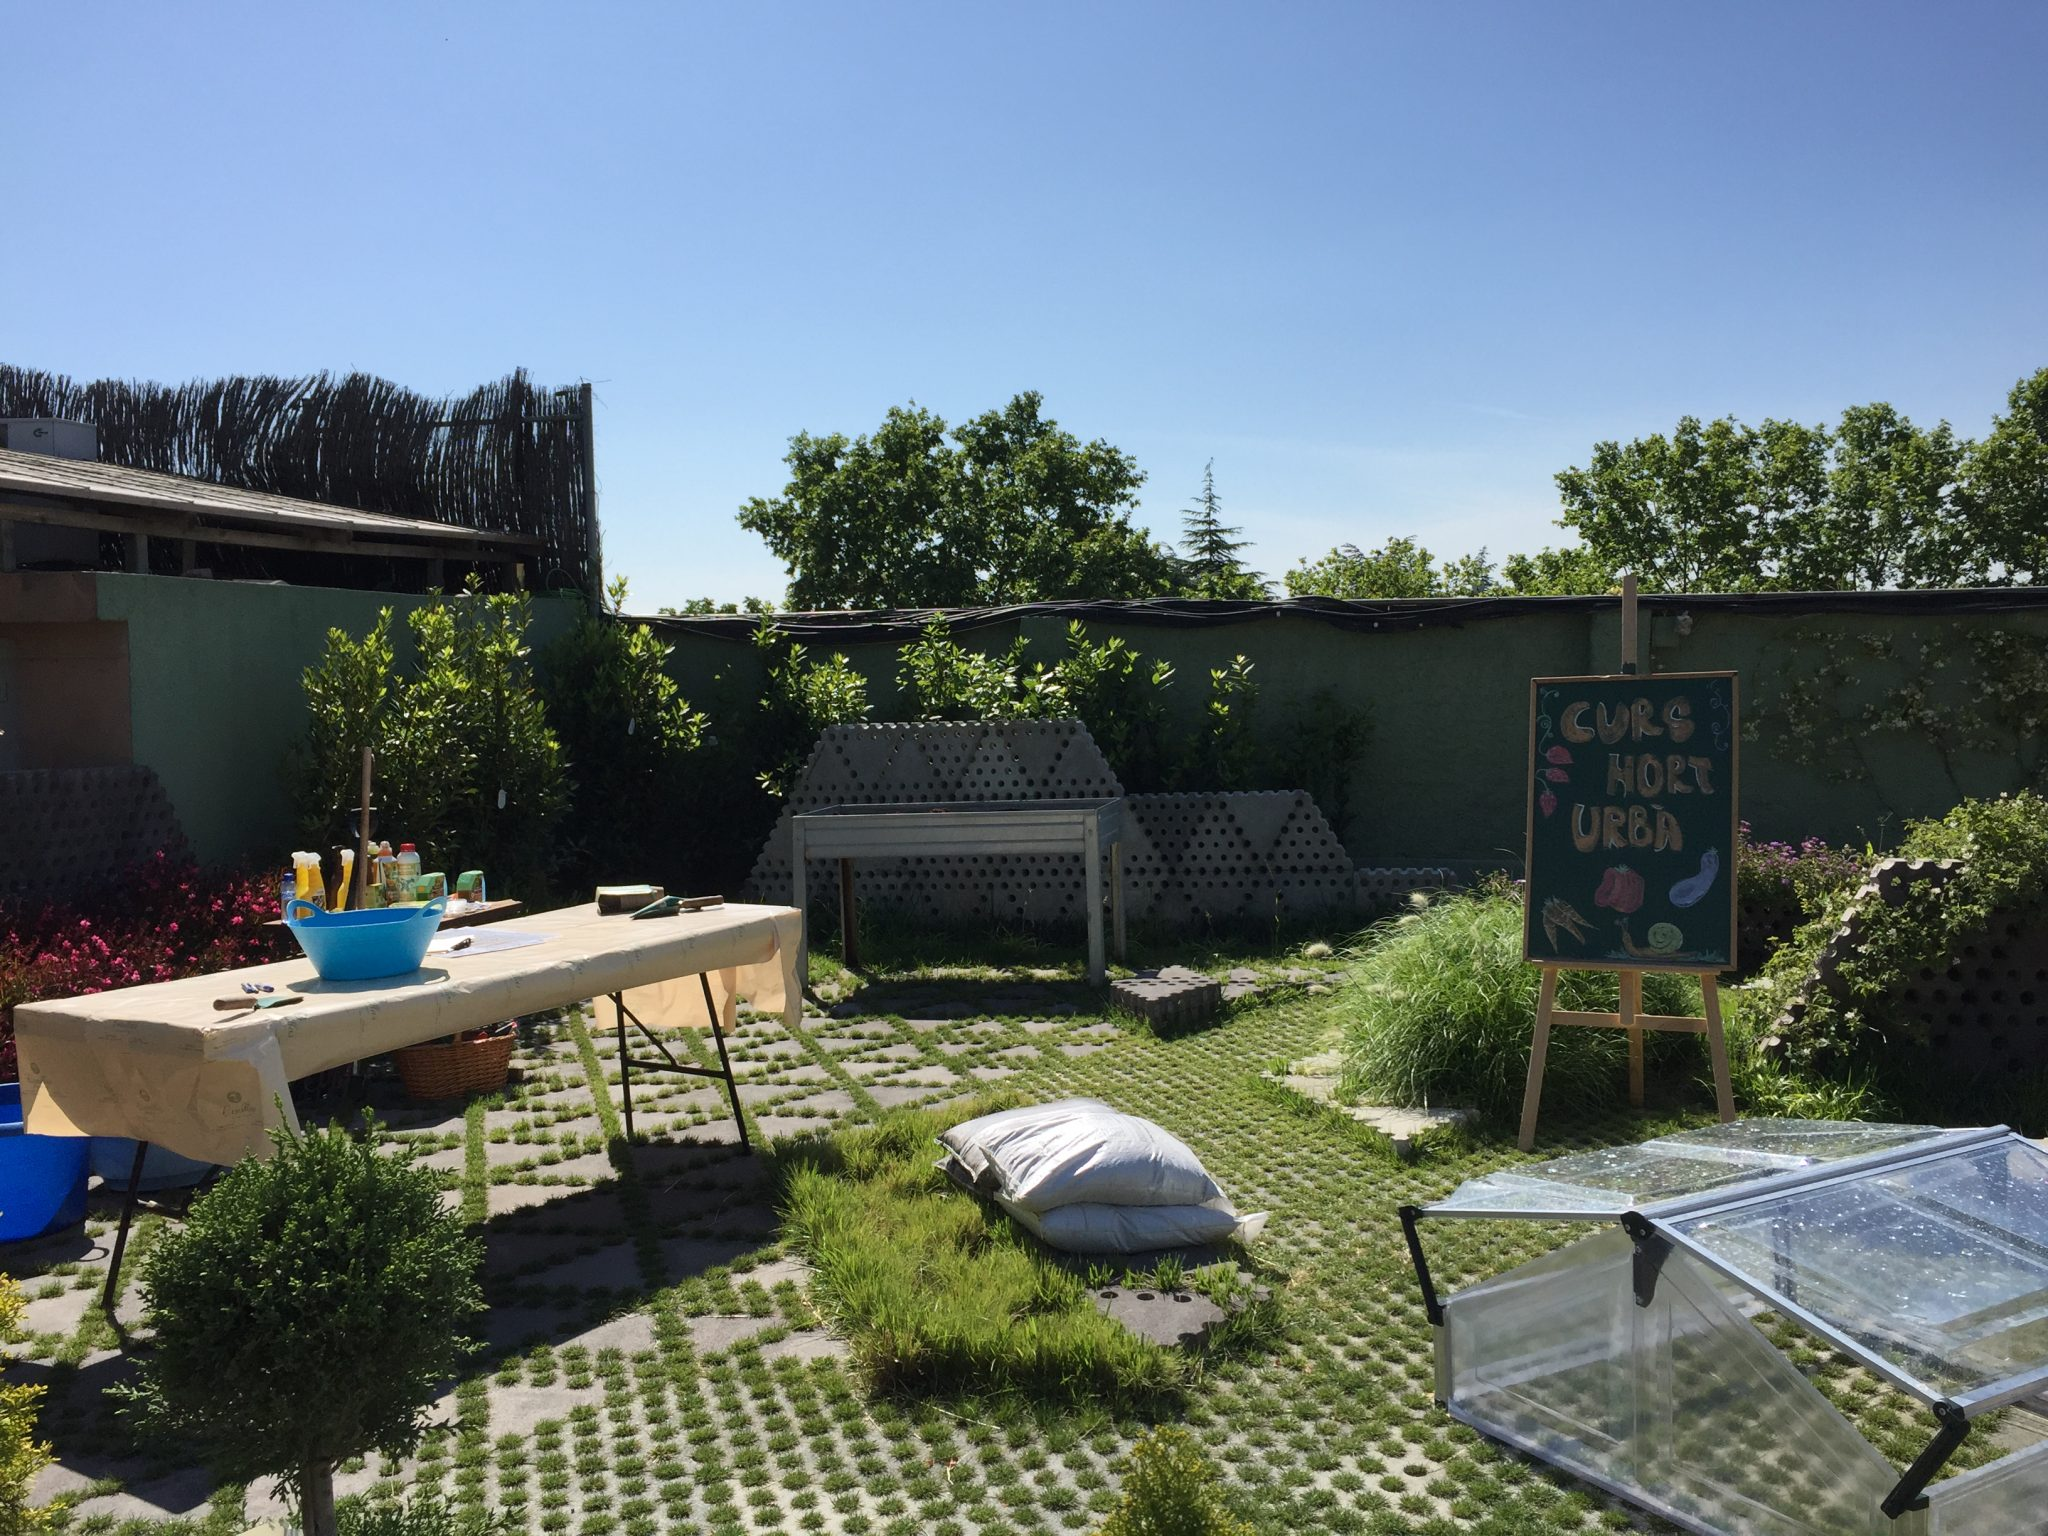 conillas-taller-huerto-urbano-ecologico-16